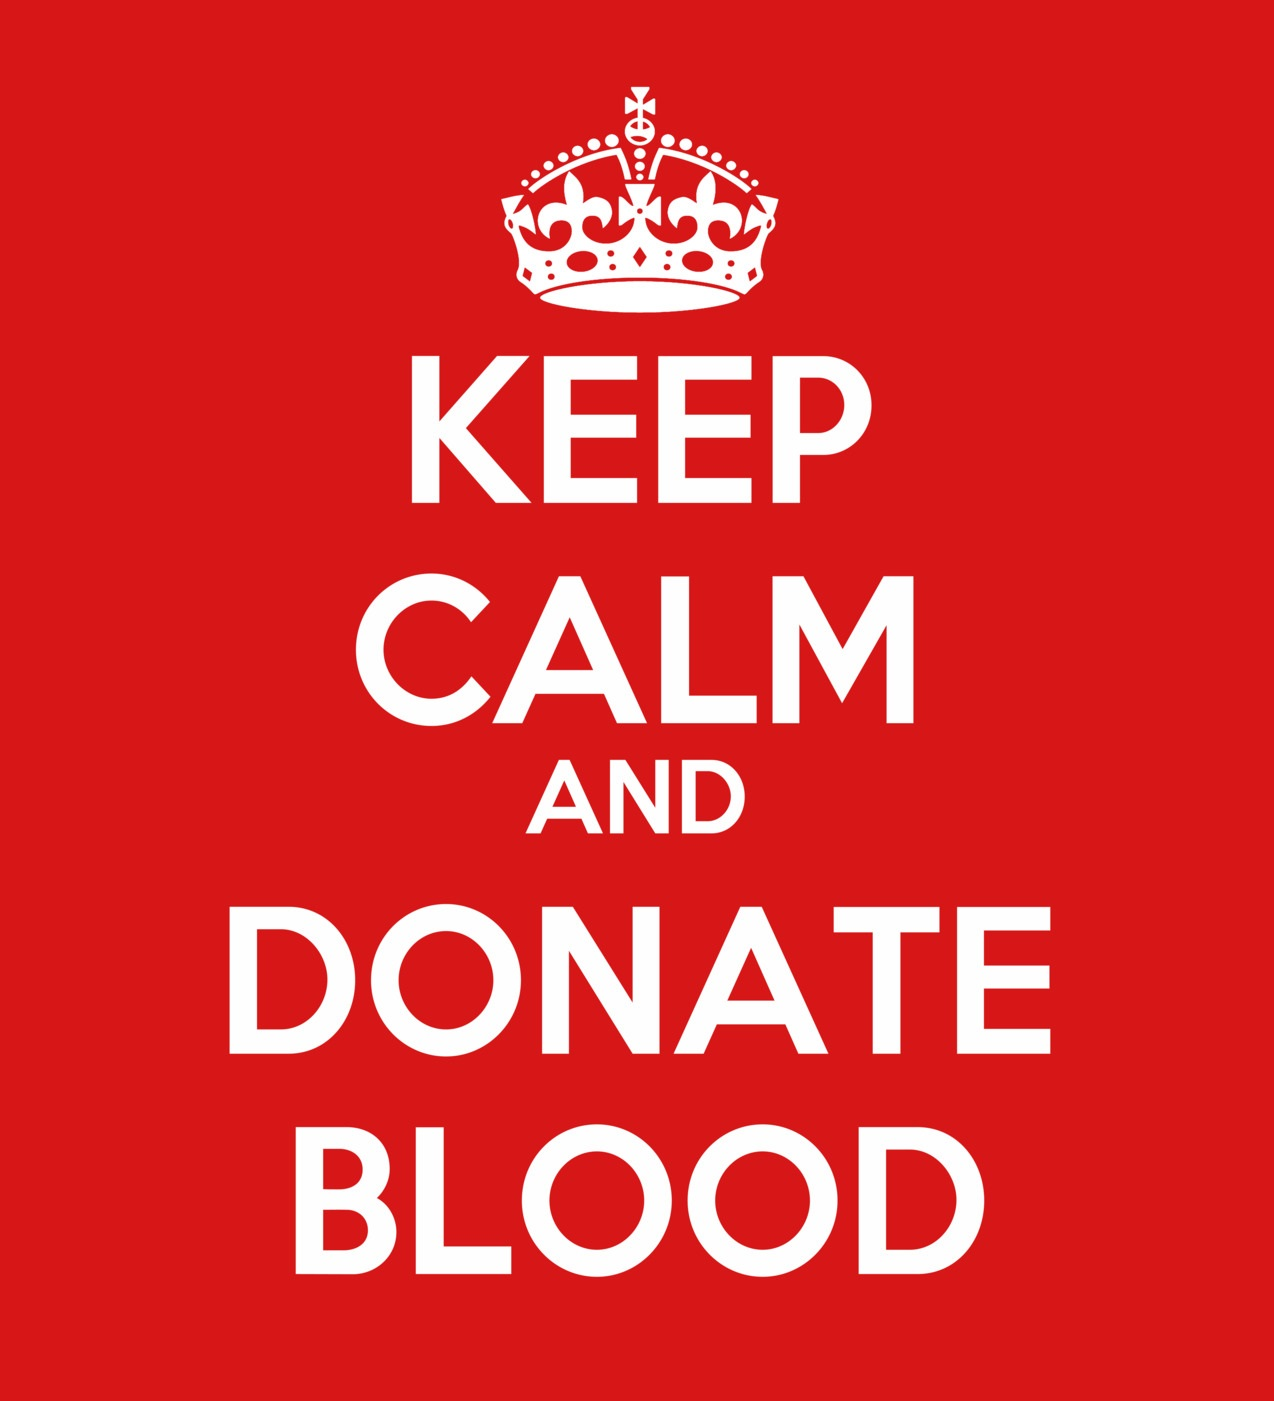 keep_calm_donate_blood.jpg